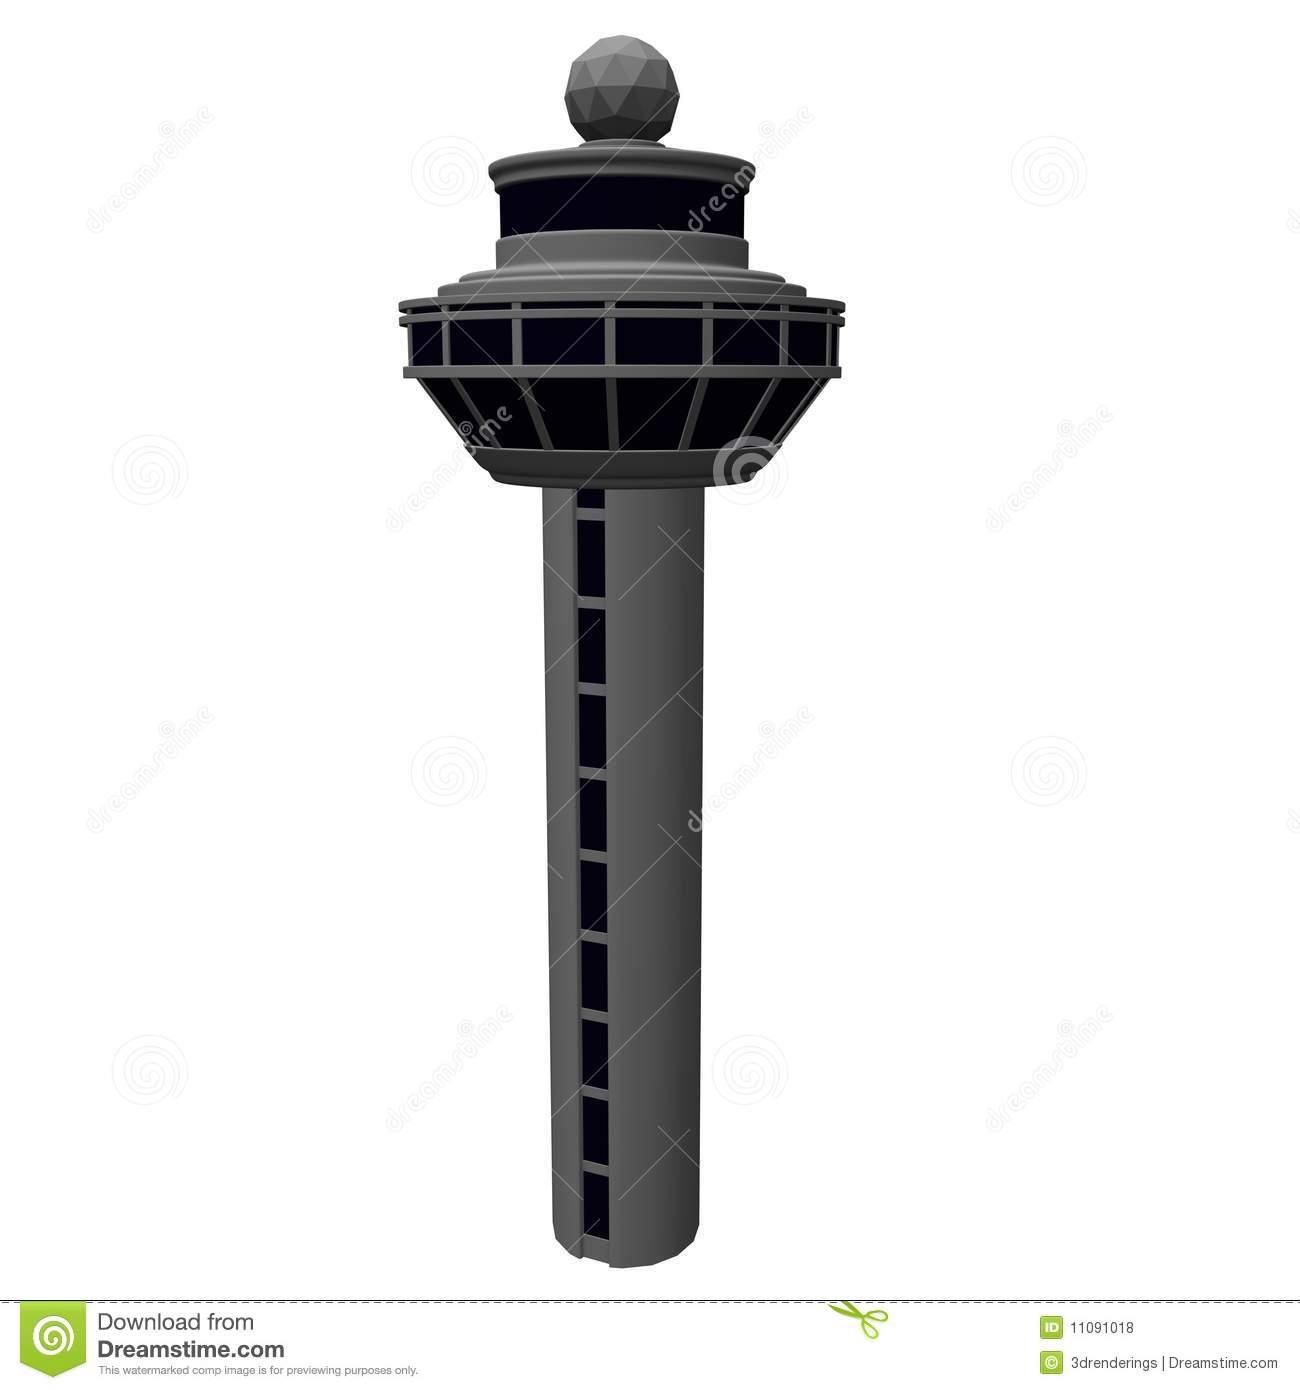 Atc tower clip art.